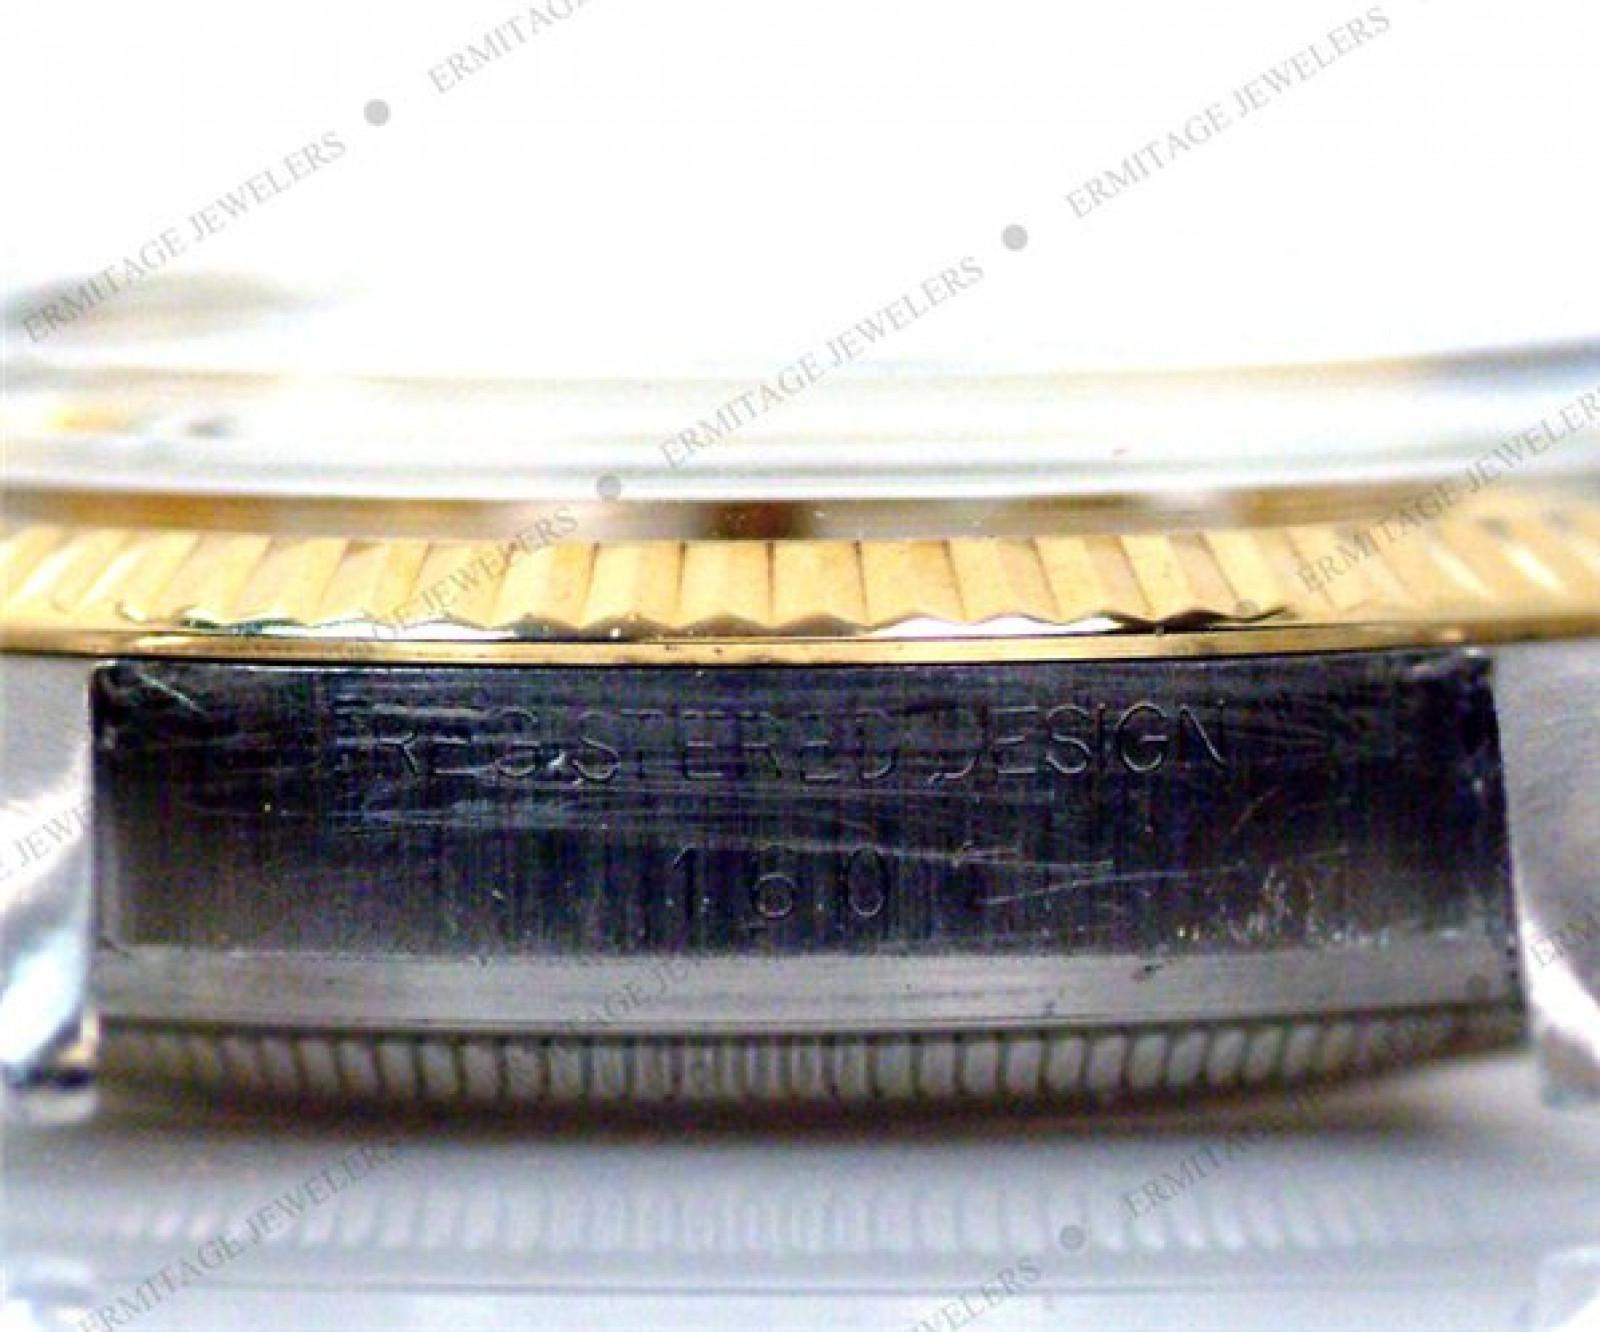 Vintage Rare Rolex Datejust 1601 Gold & Steel Circa 1972